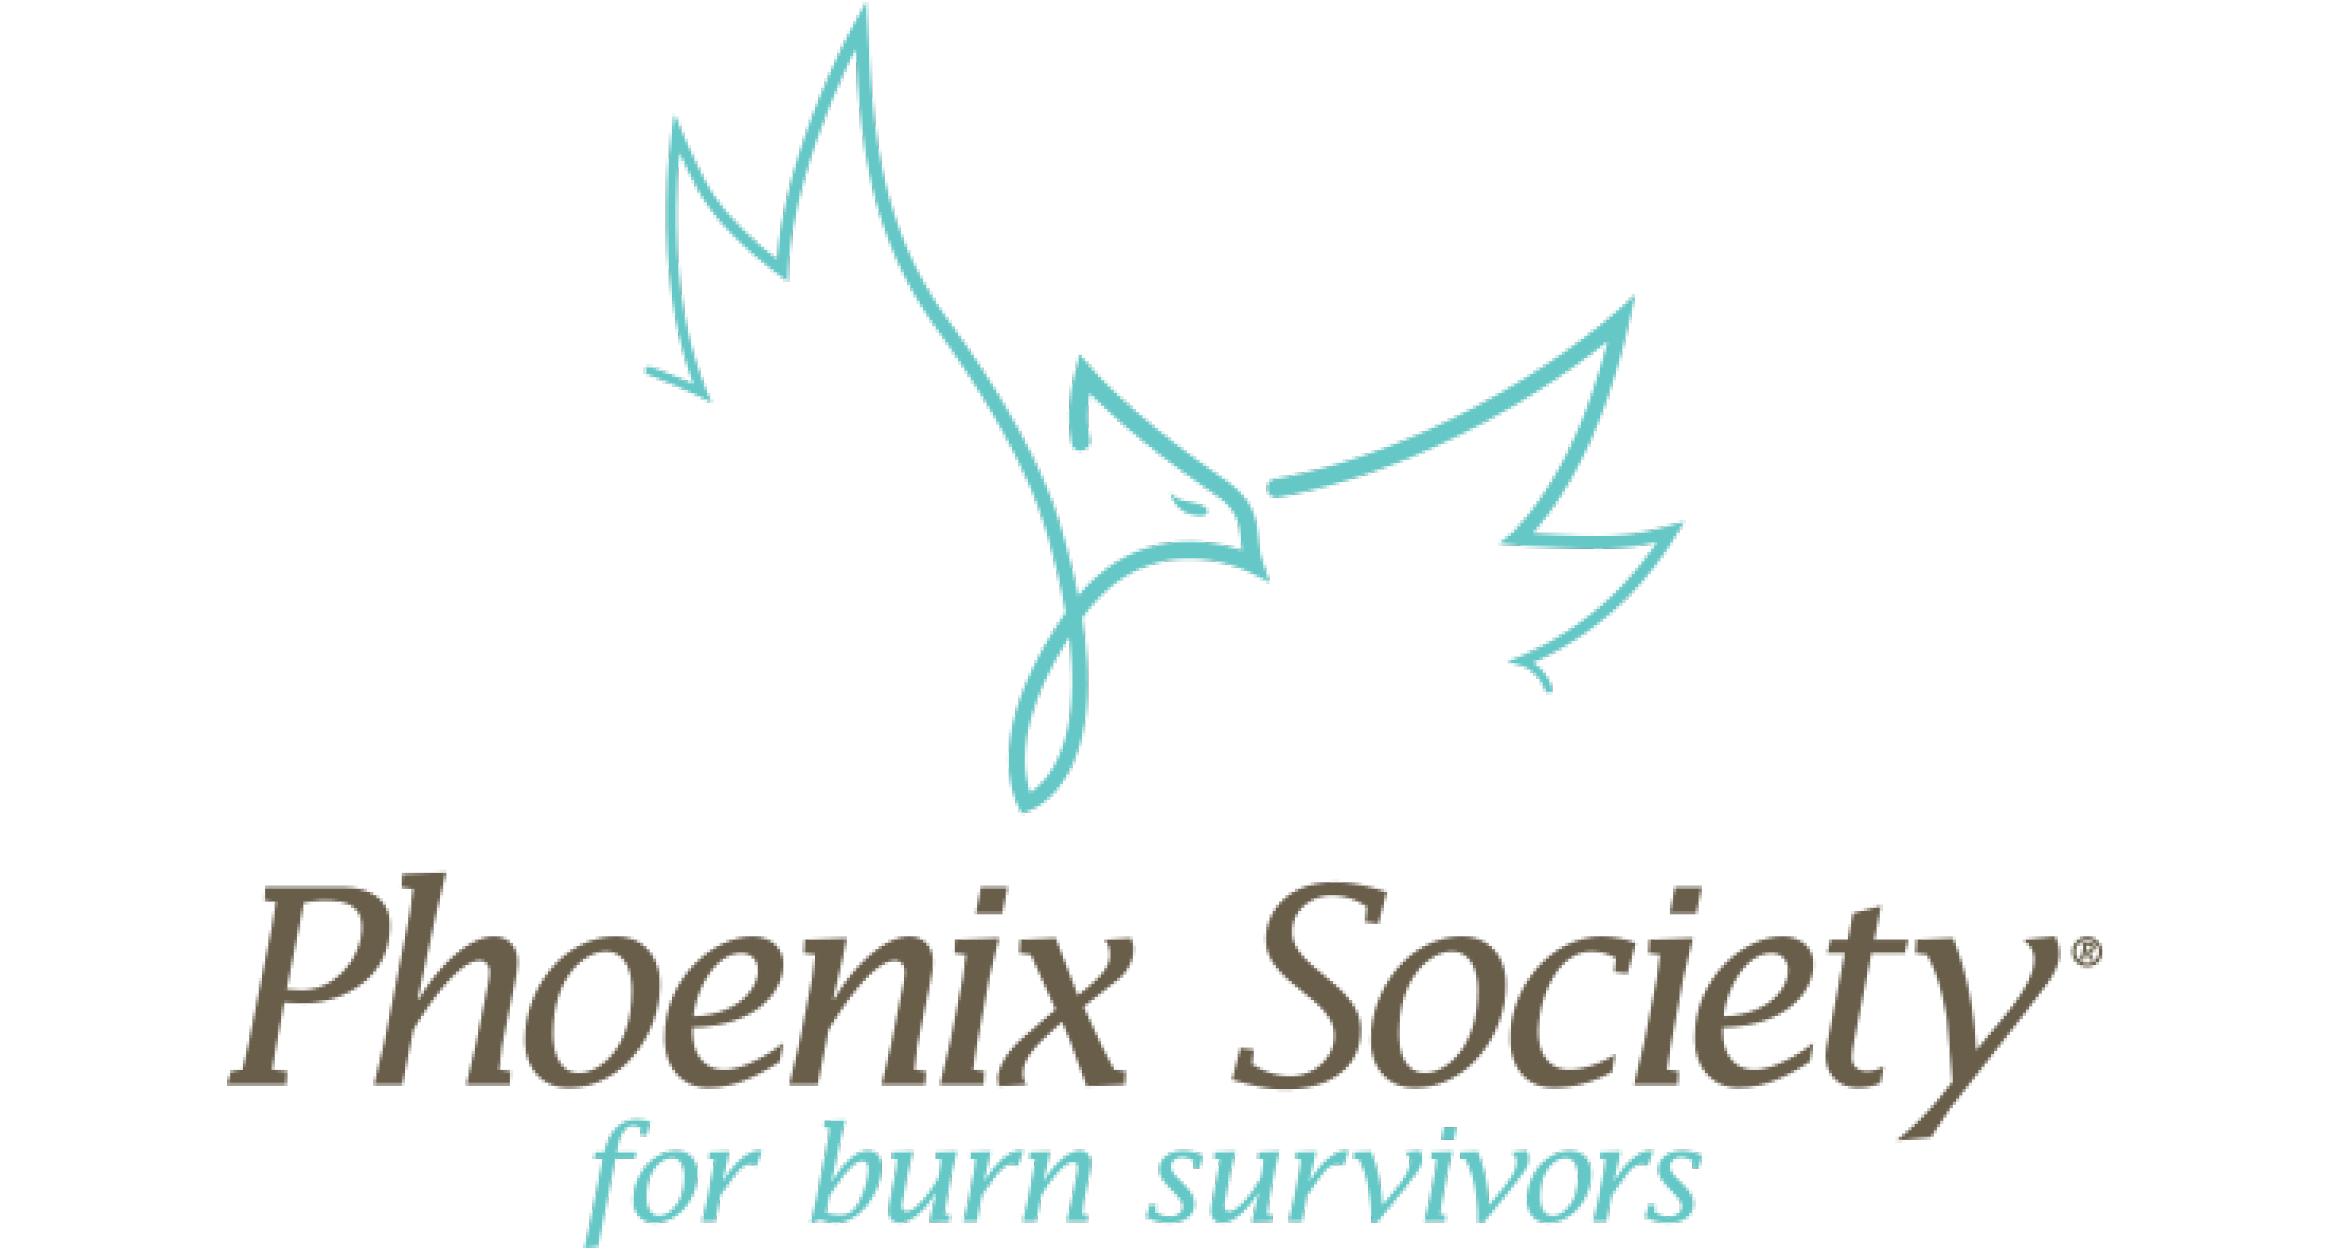 Pheonix Society logo